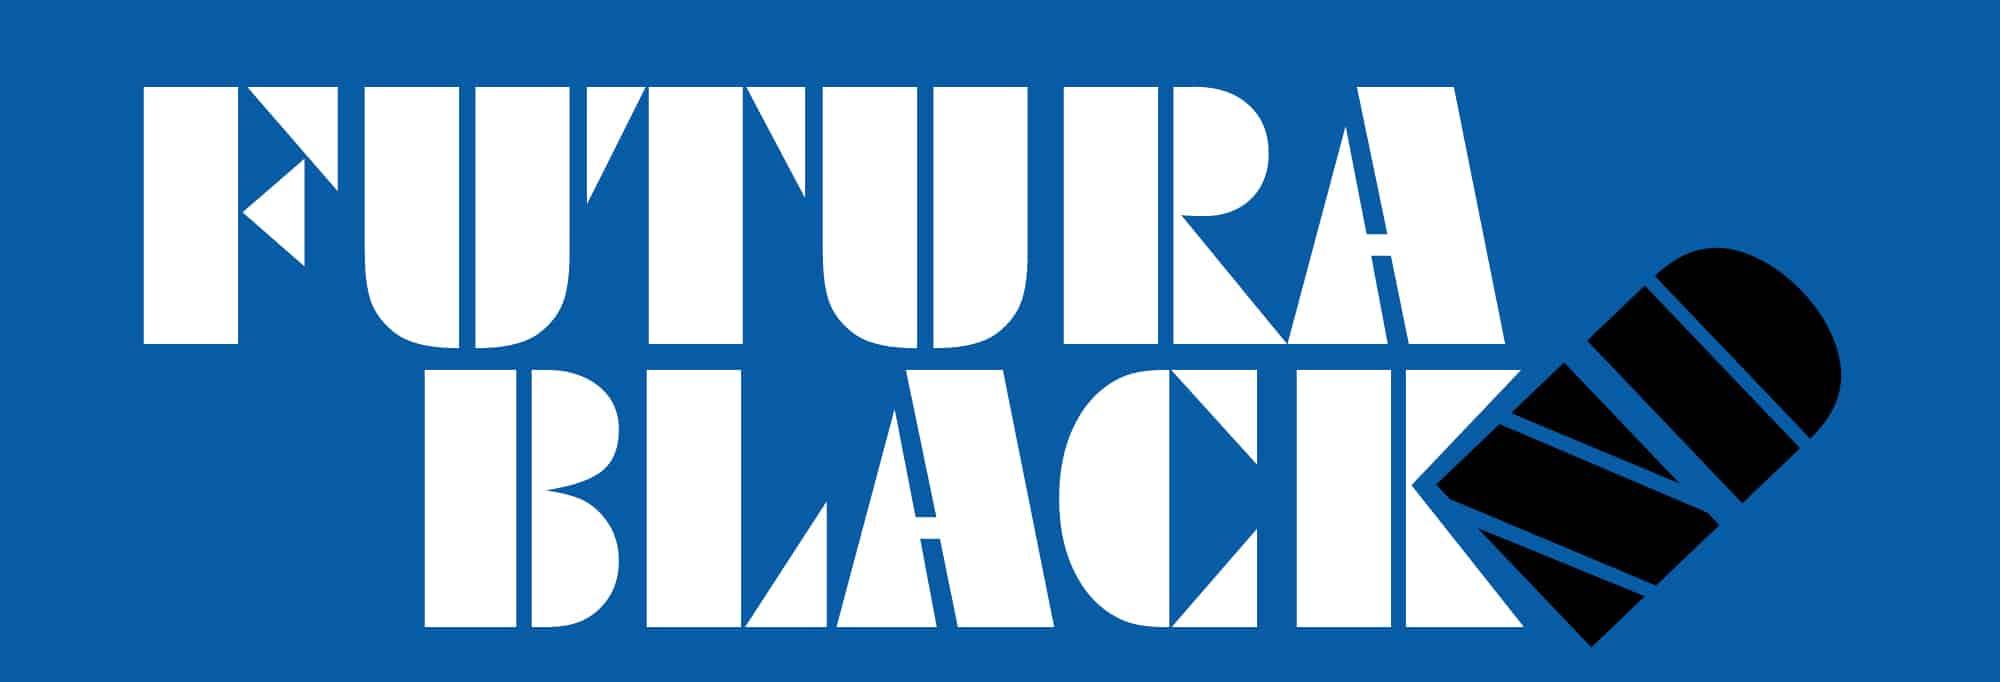 CTV_FuturaBlack-ND_bauertypes_01